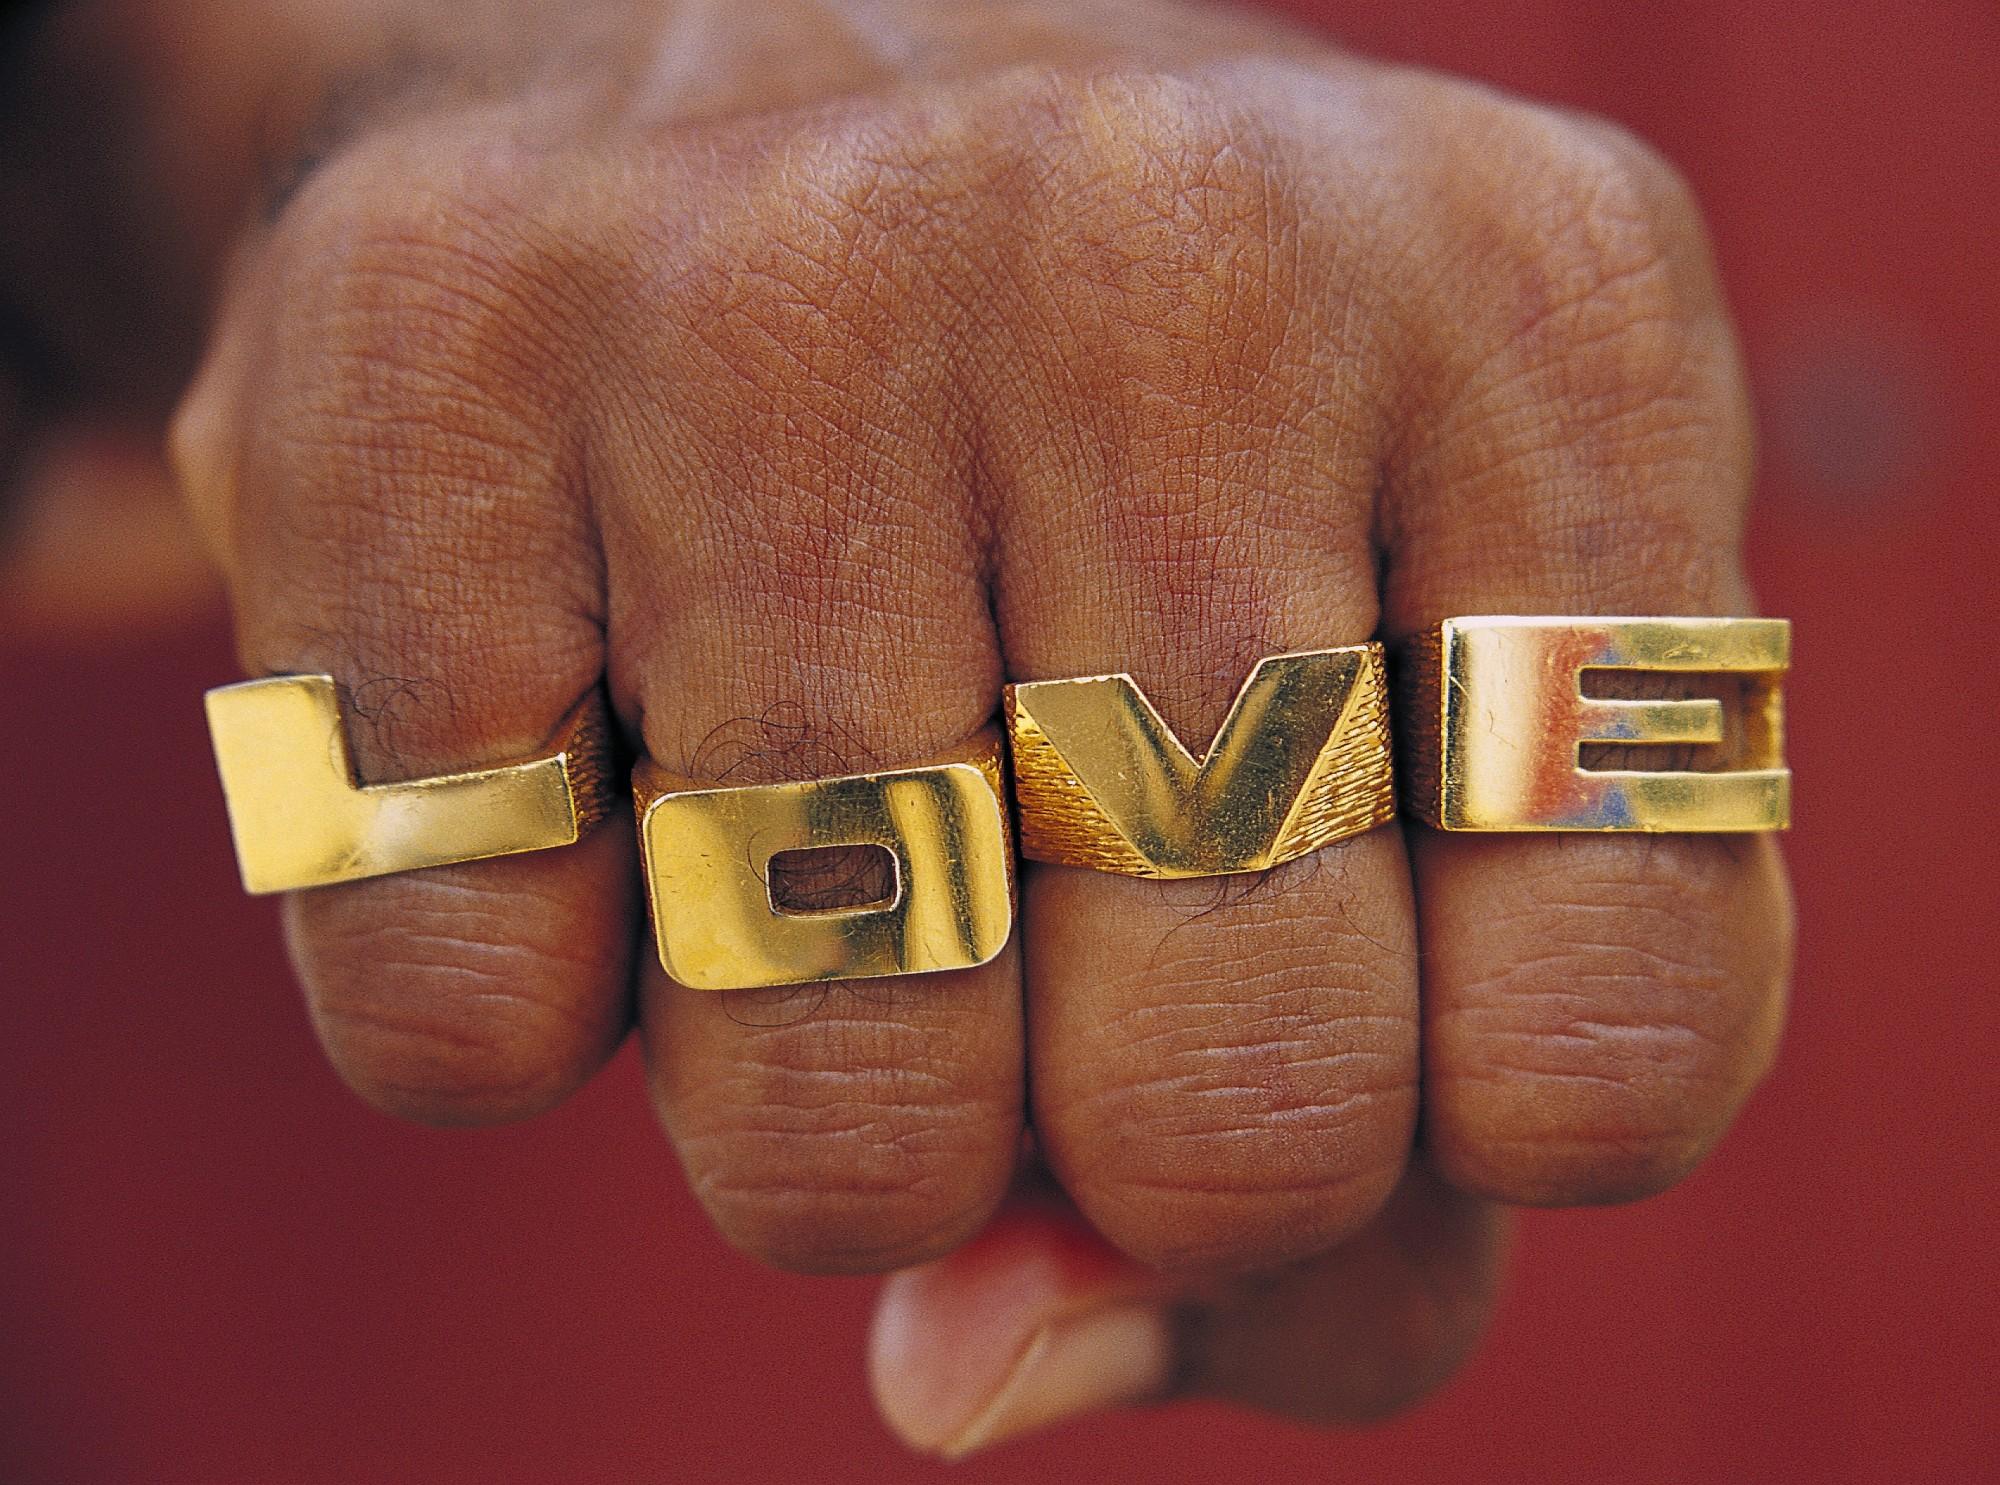 Ijs37 Love 2003